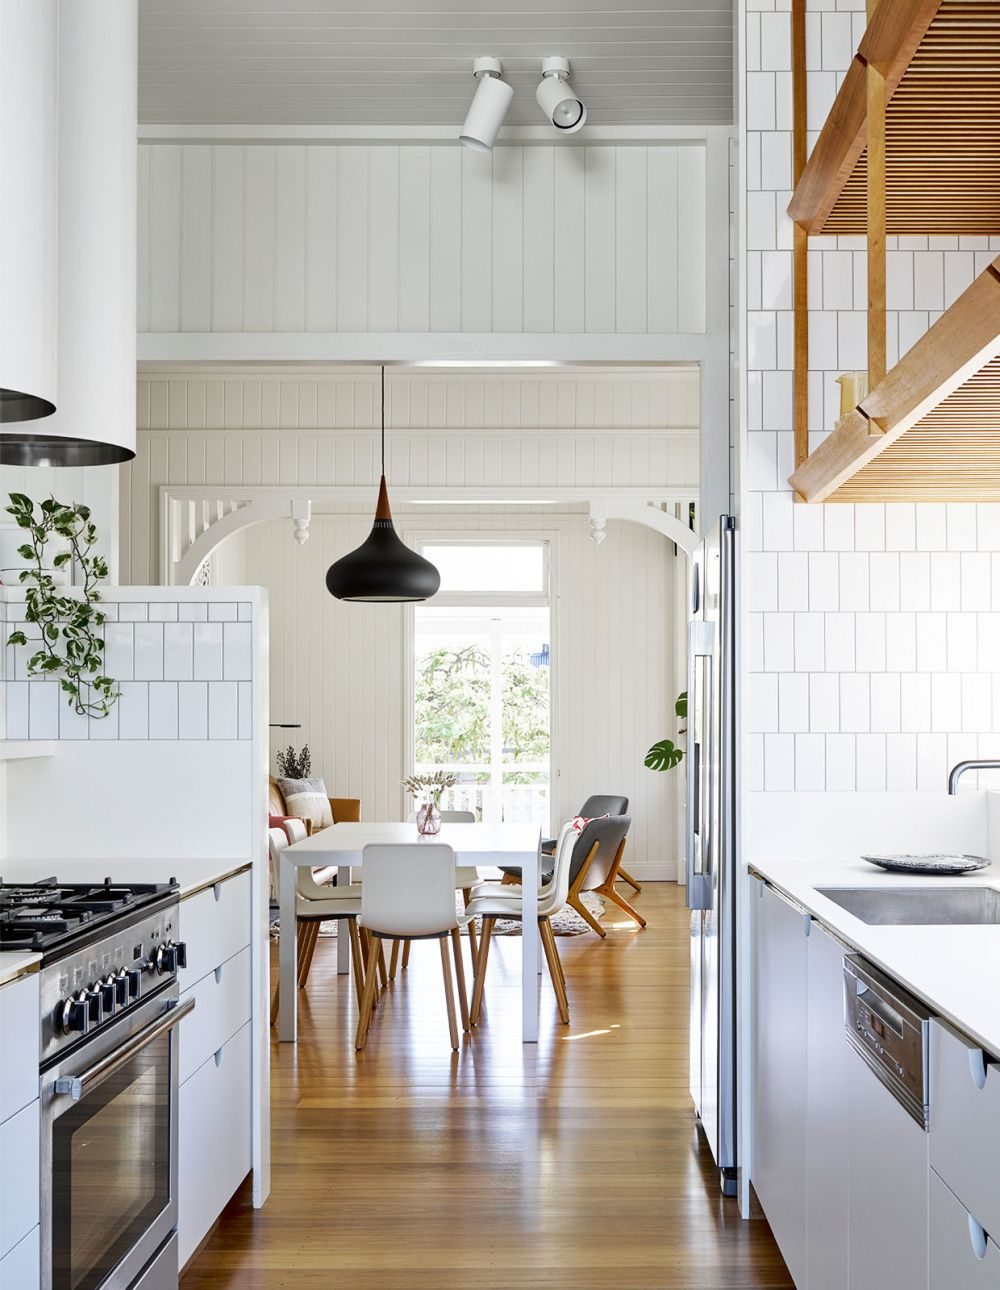 renovating a classic queenslander and celebrating timber in 2020 kitchen interior on kitchen interior queenslander id=59330